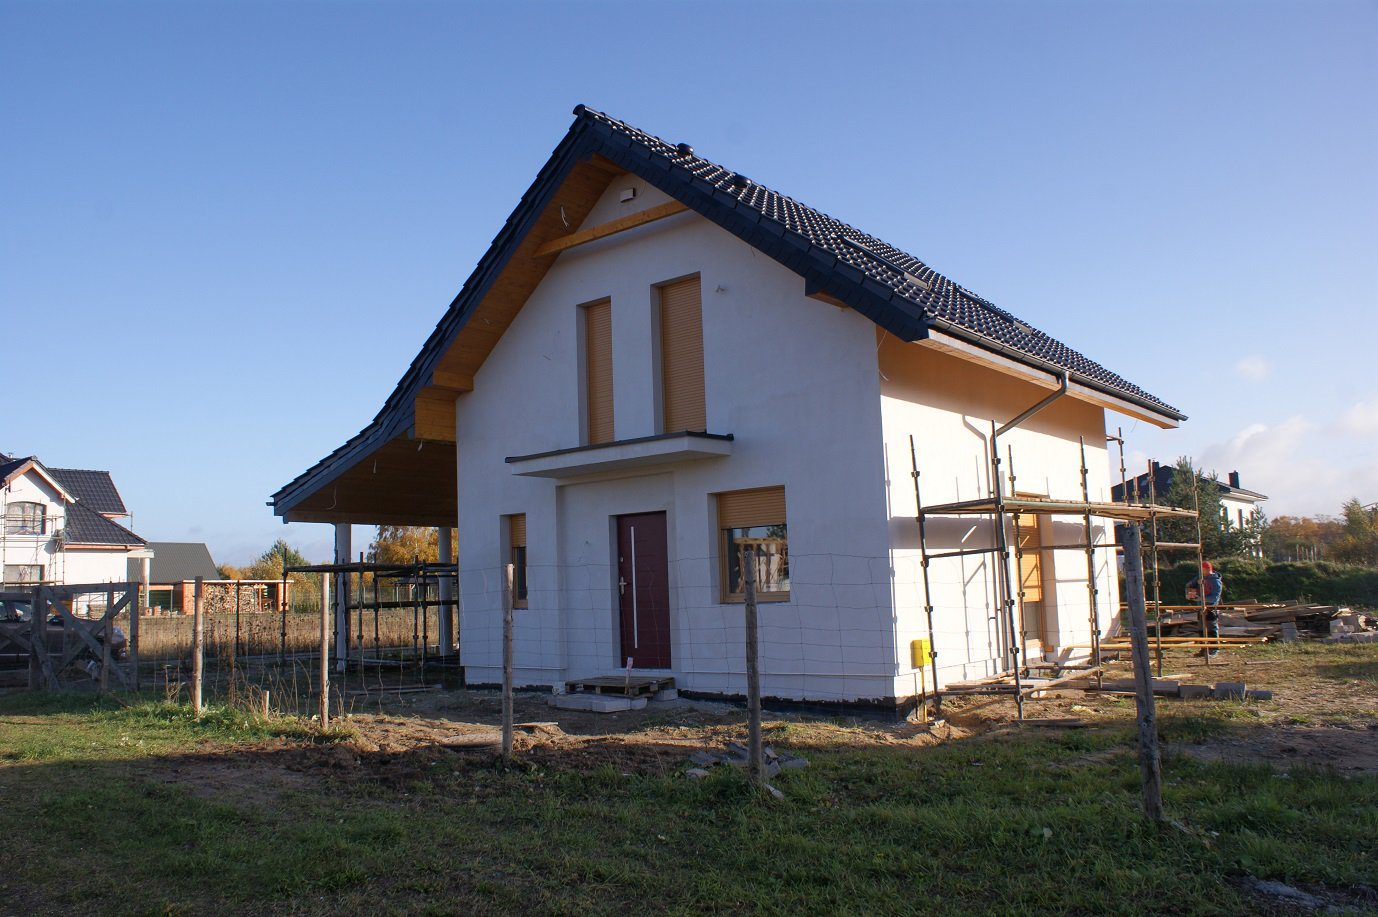 proyekt-doma-olyenka-fot-15-1465211457-ajnmd33x.jpg